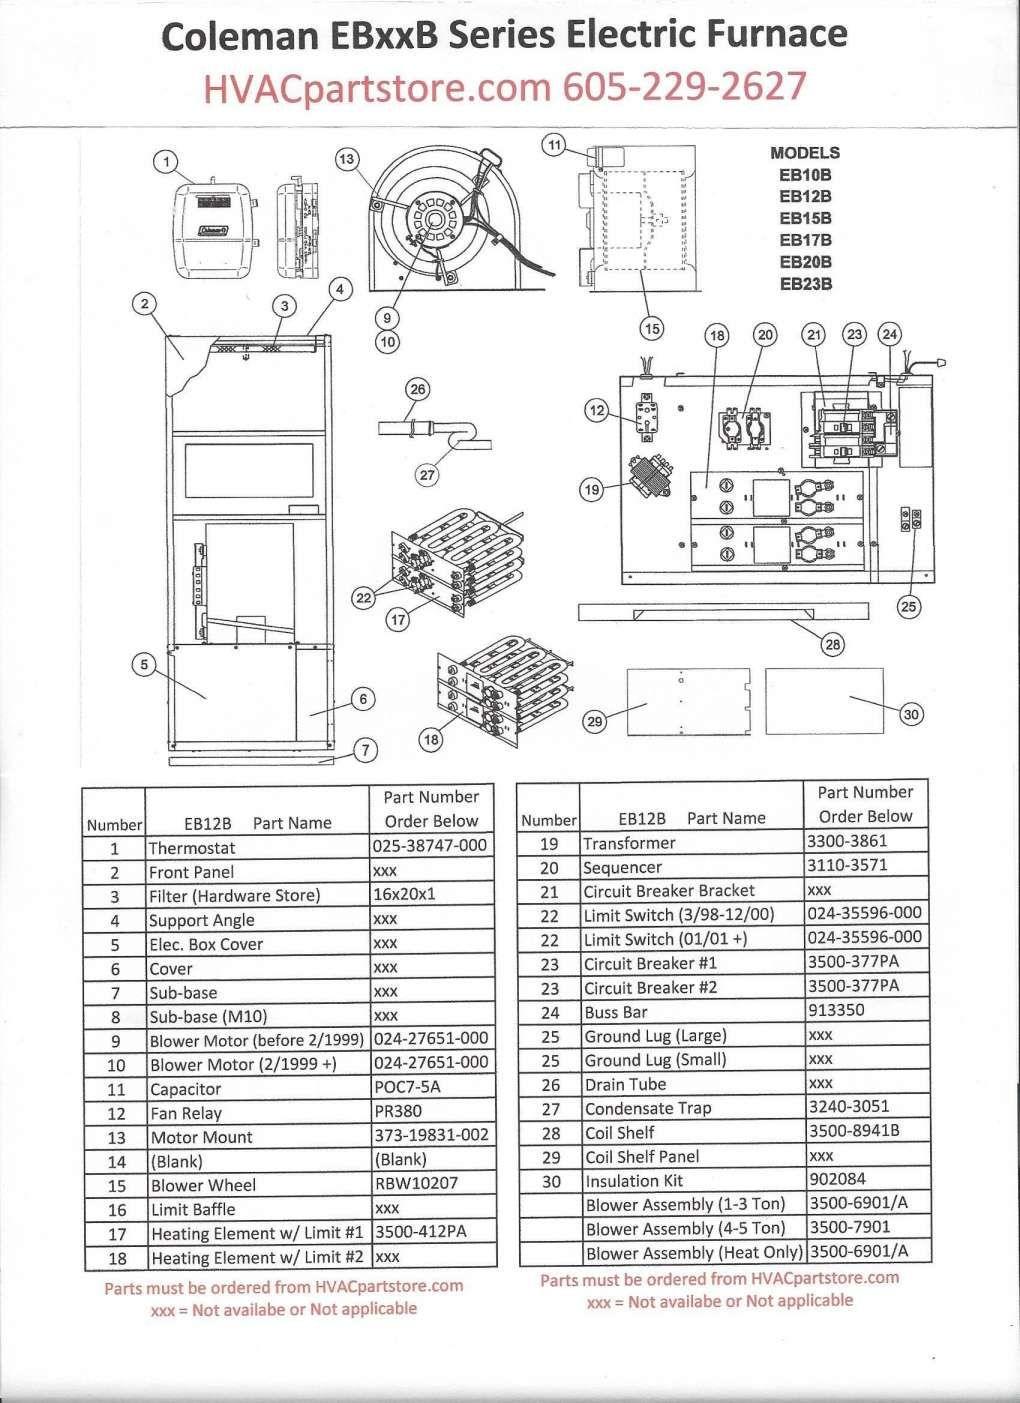 Polaris Ranger Wiring Diagram For Heater